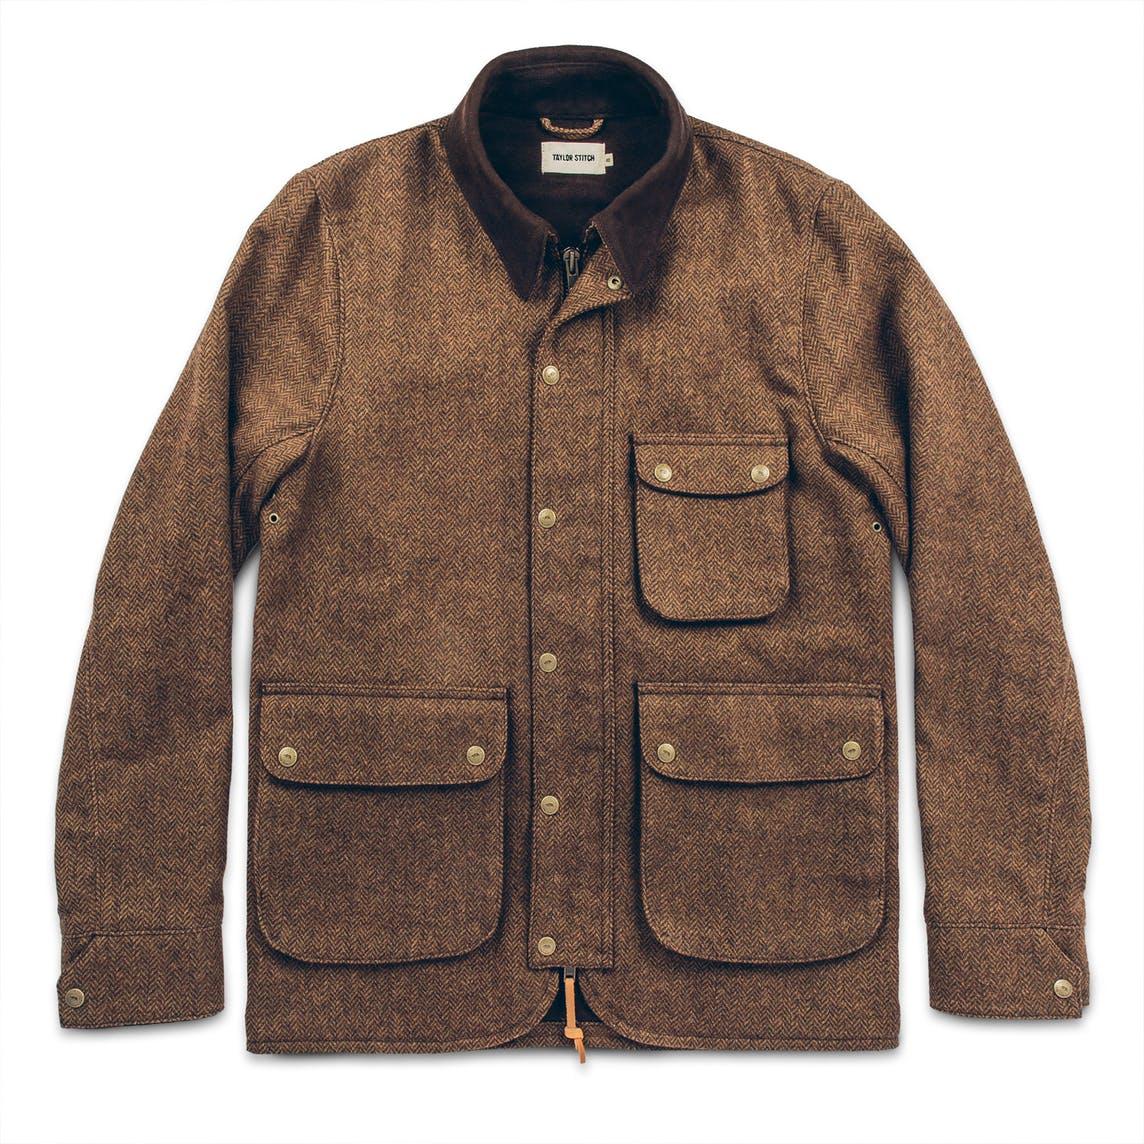 taylor-stitch-rover-jacket